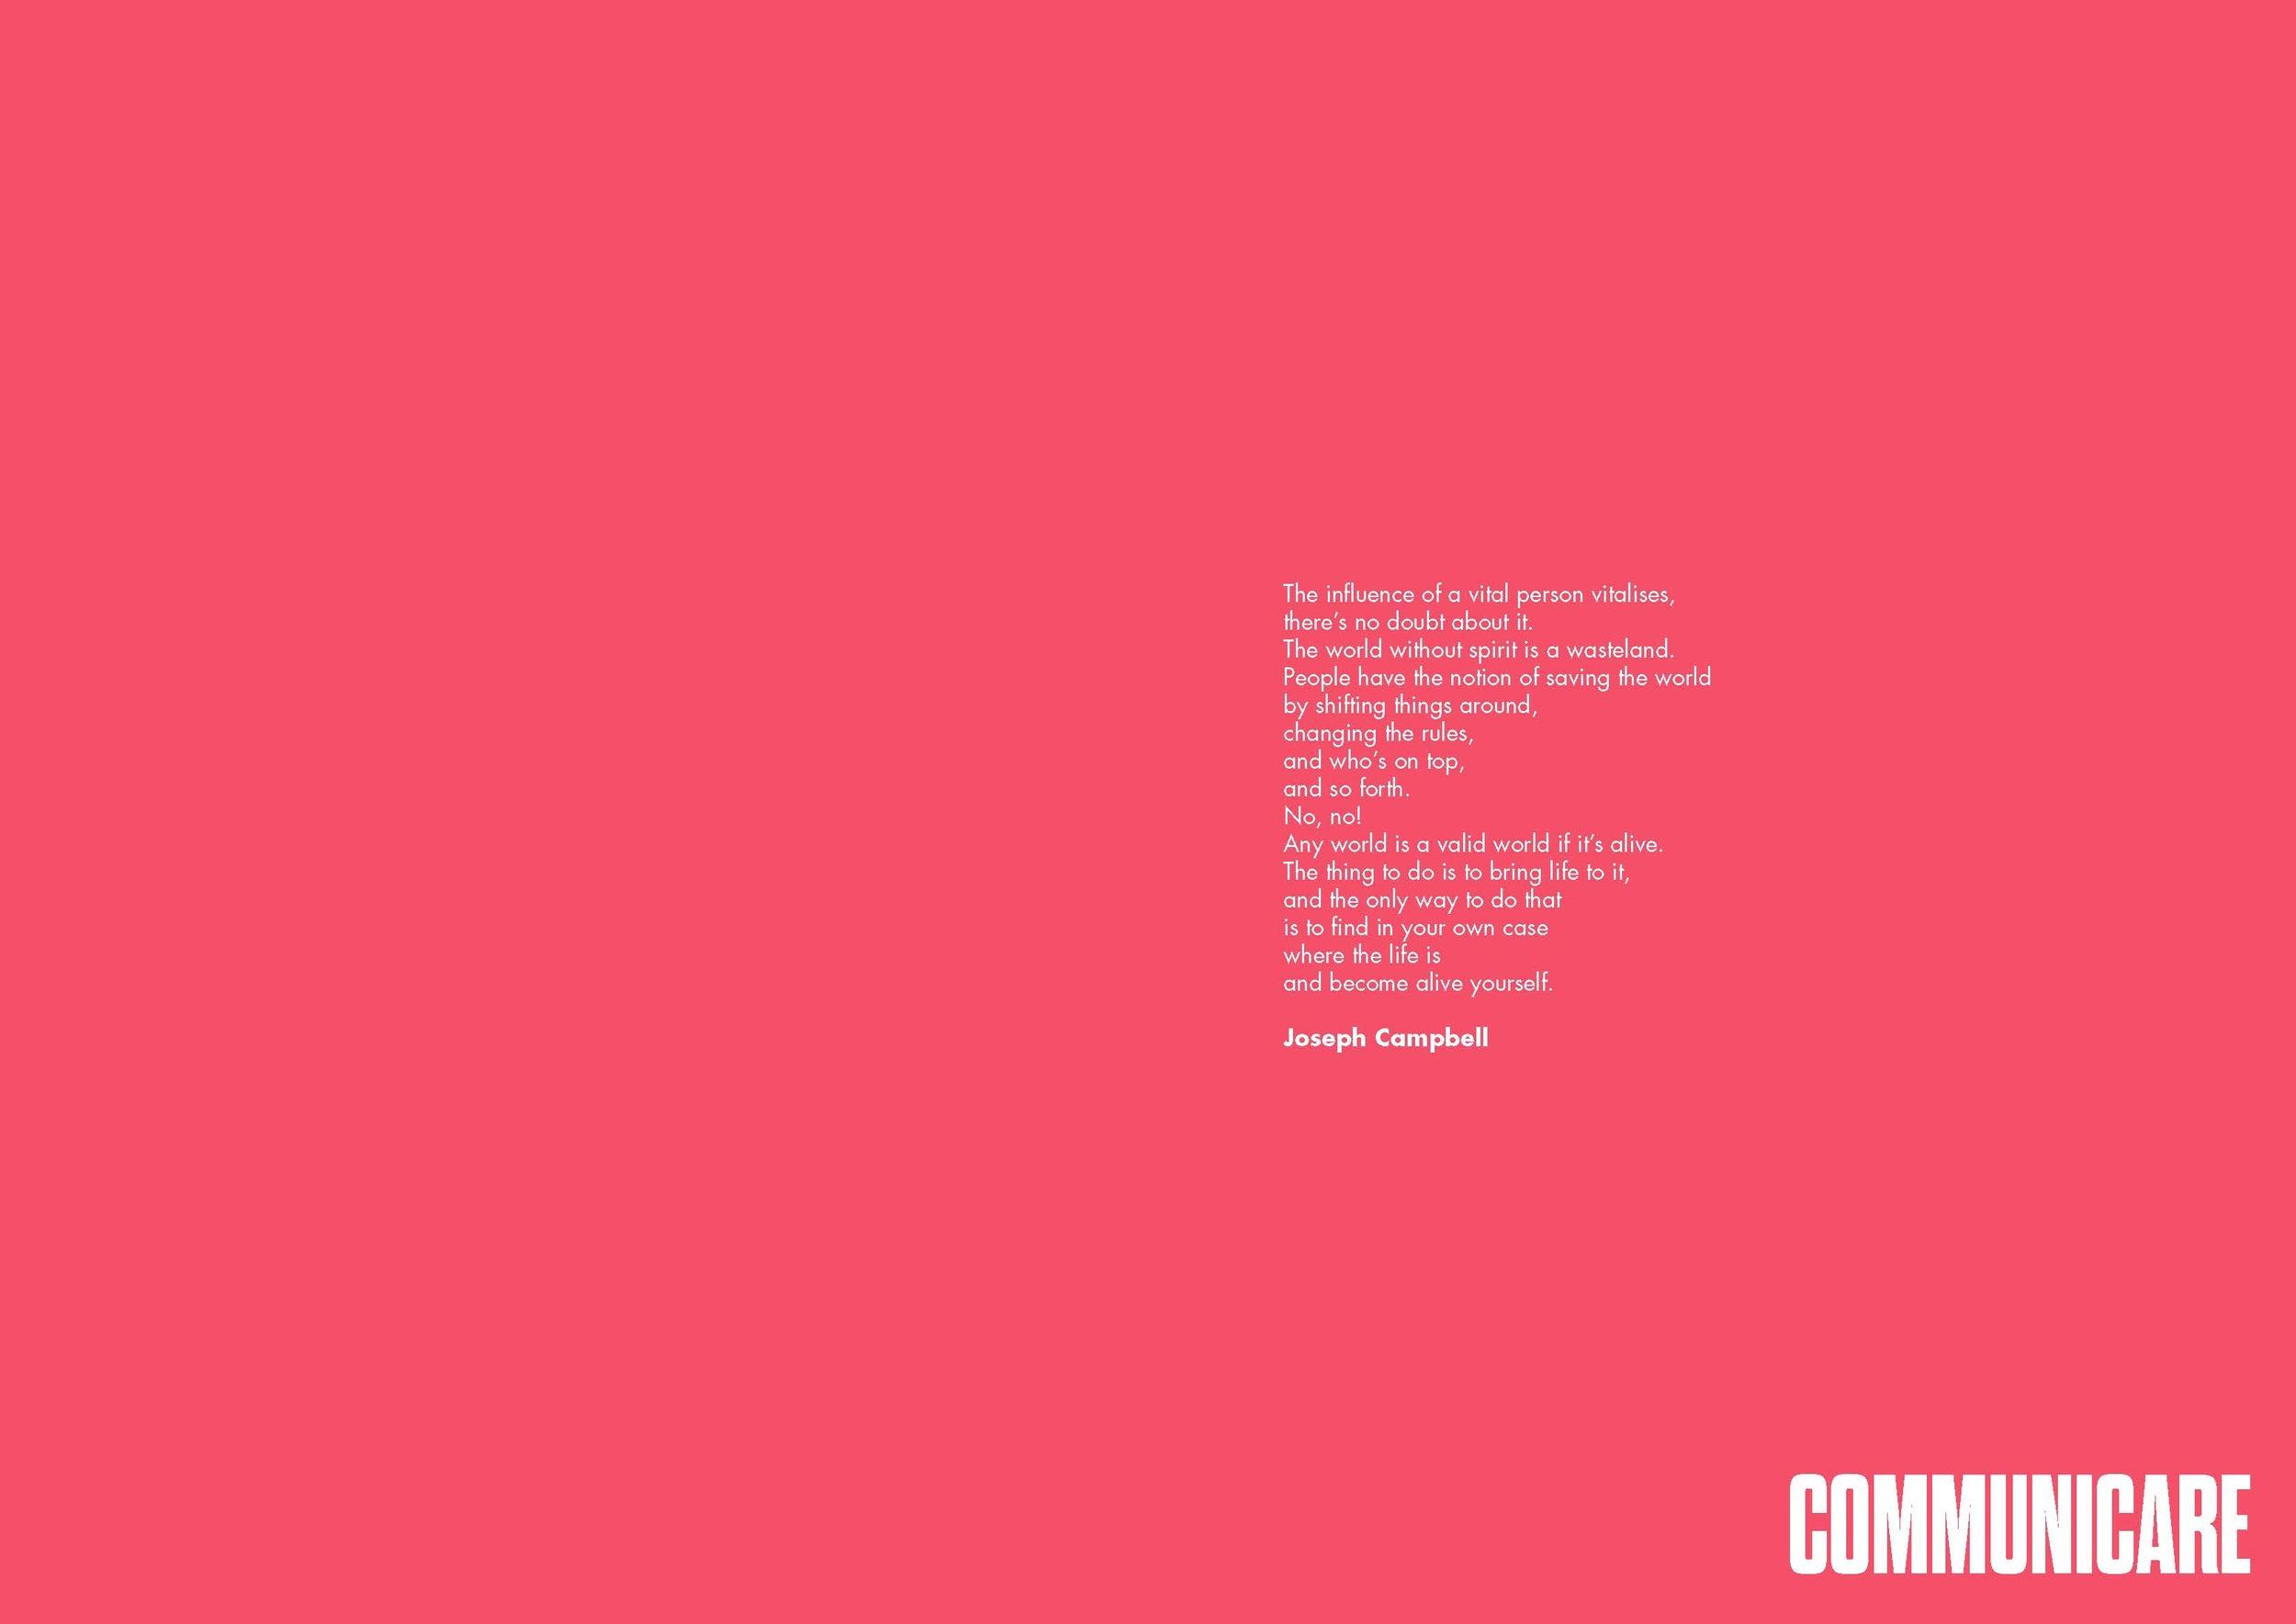 Communicare Digital PDF_Page_02.jpg